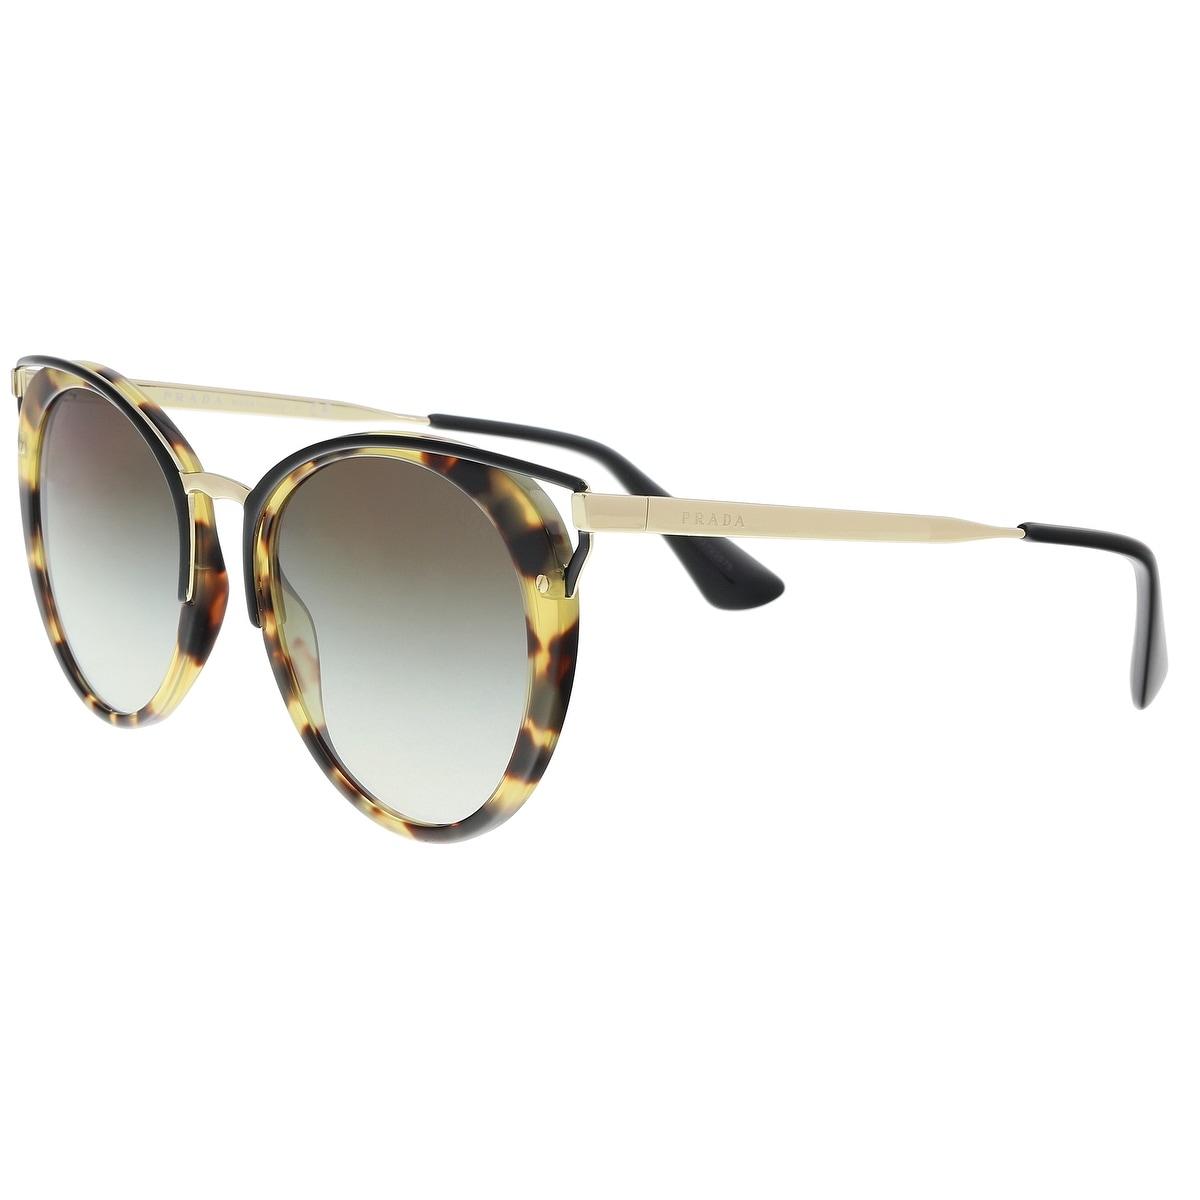 163d01685ceb Shop Prada PR 66TS 7S00A7 Medium Havana Cat eye Sunglasses - 54-20 ...